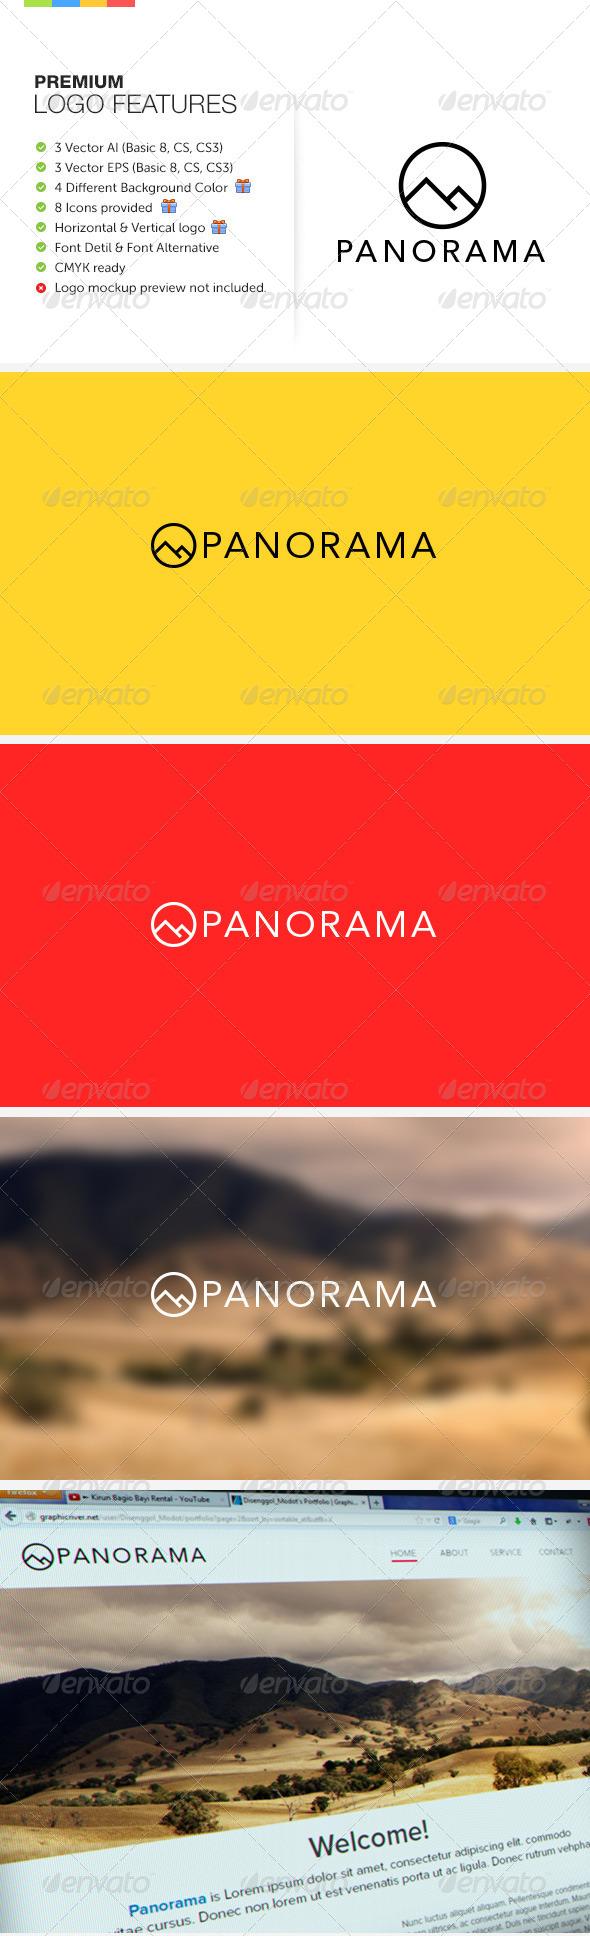 GraphicRiver Panorama Logo 6457014